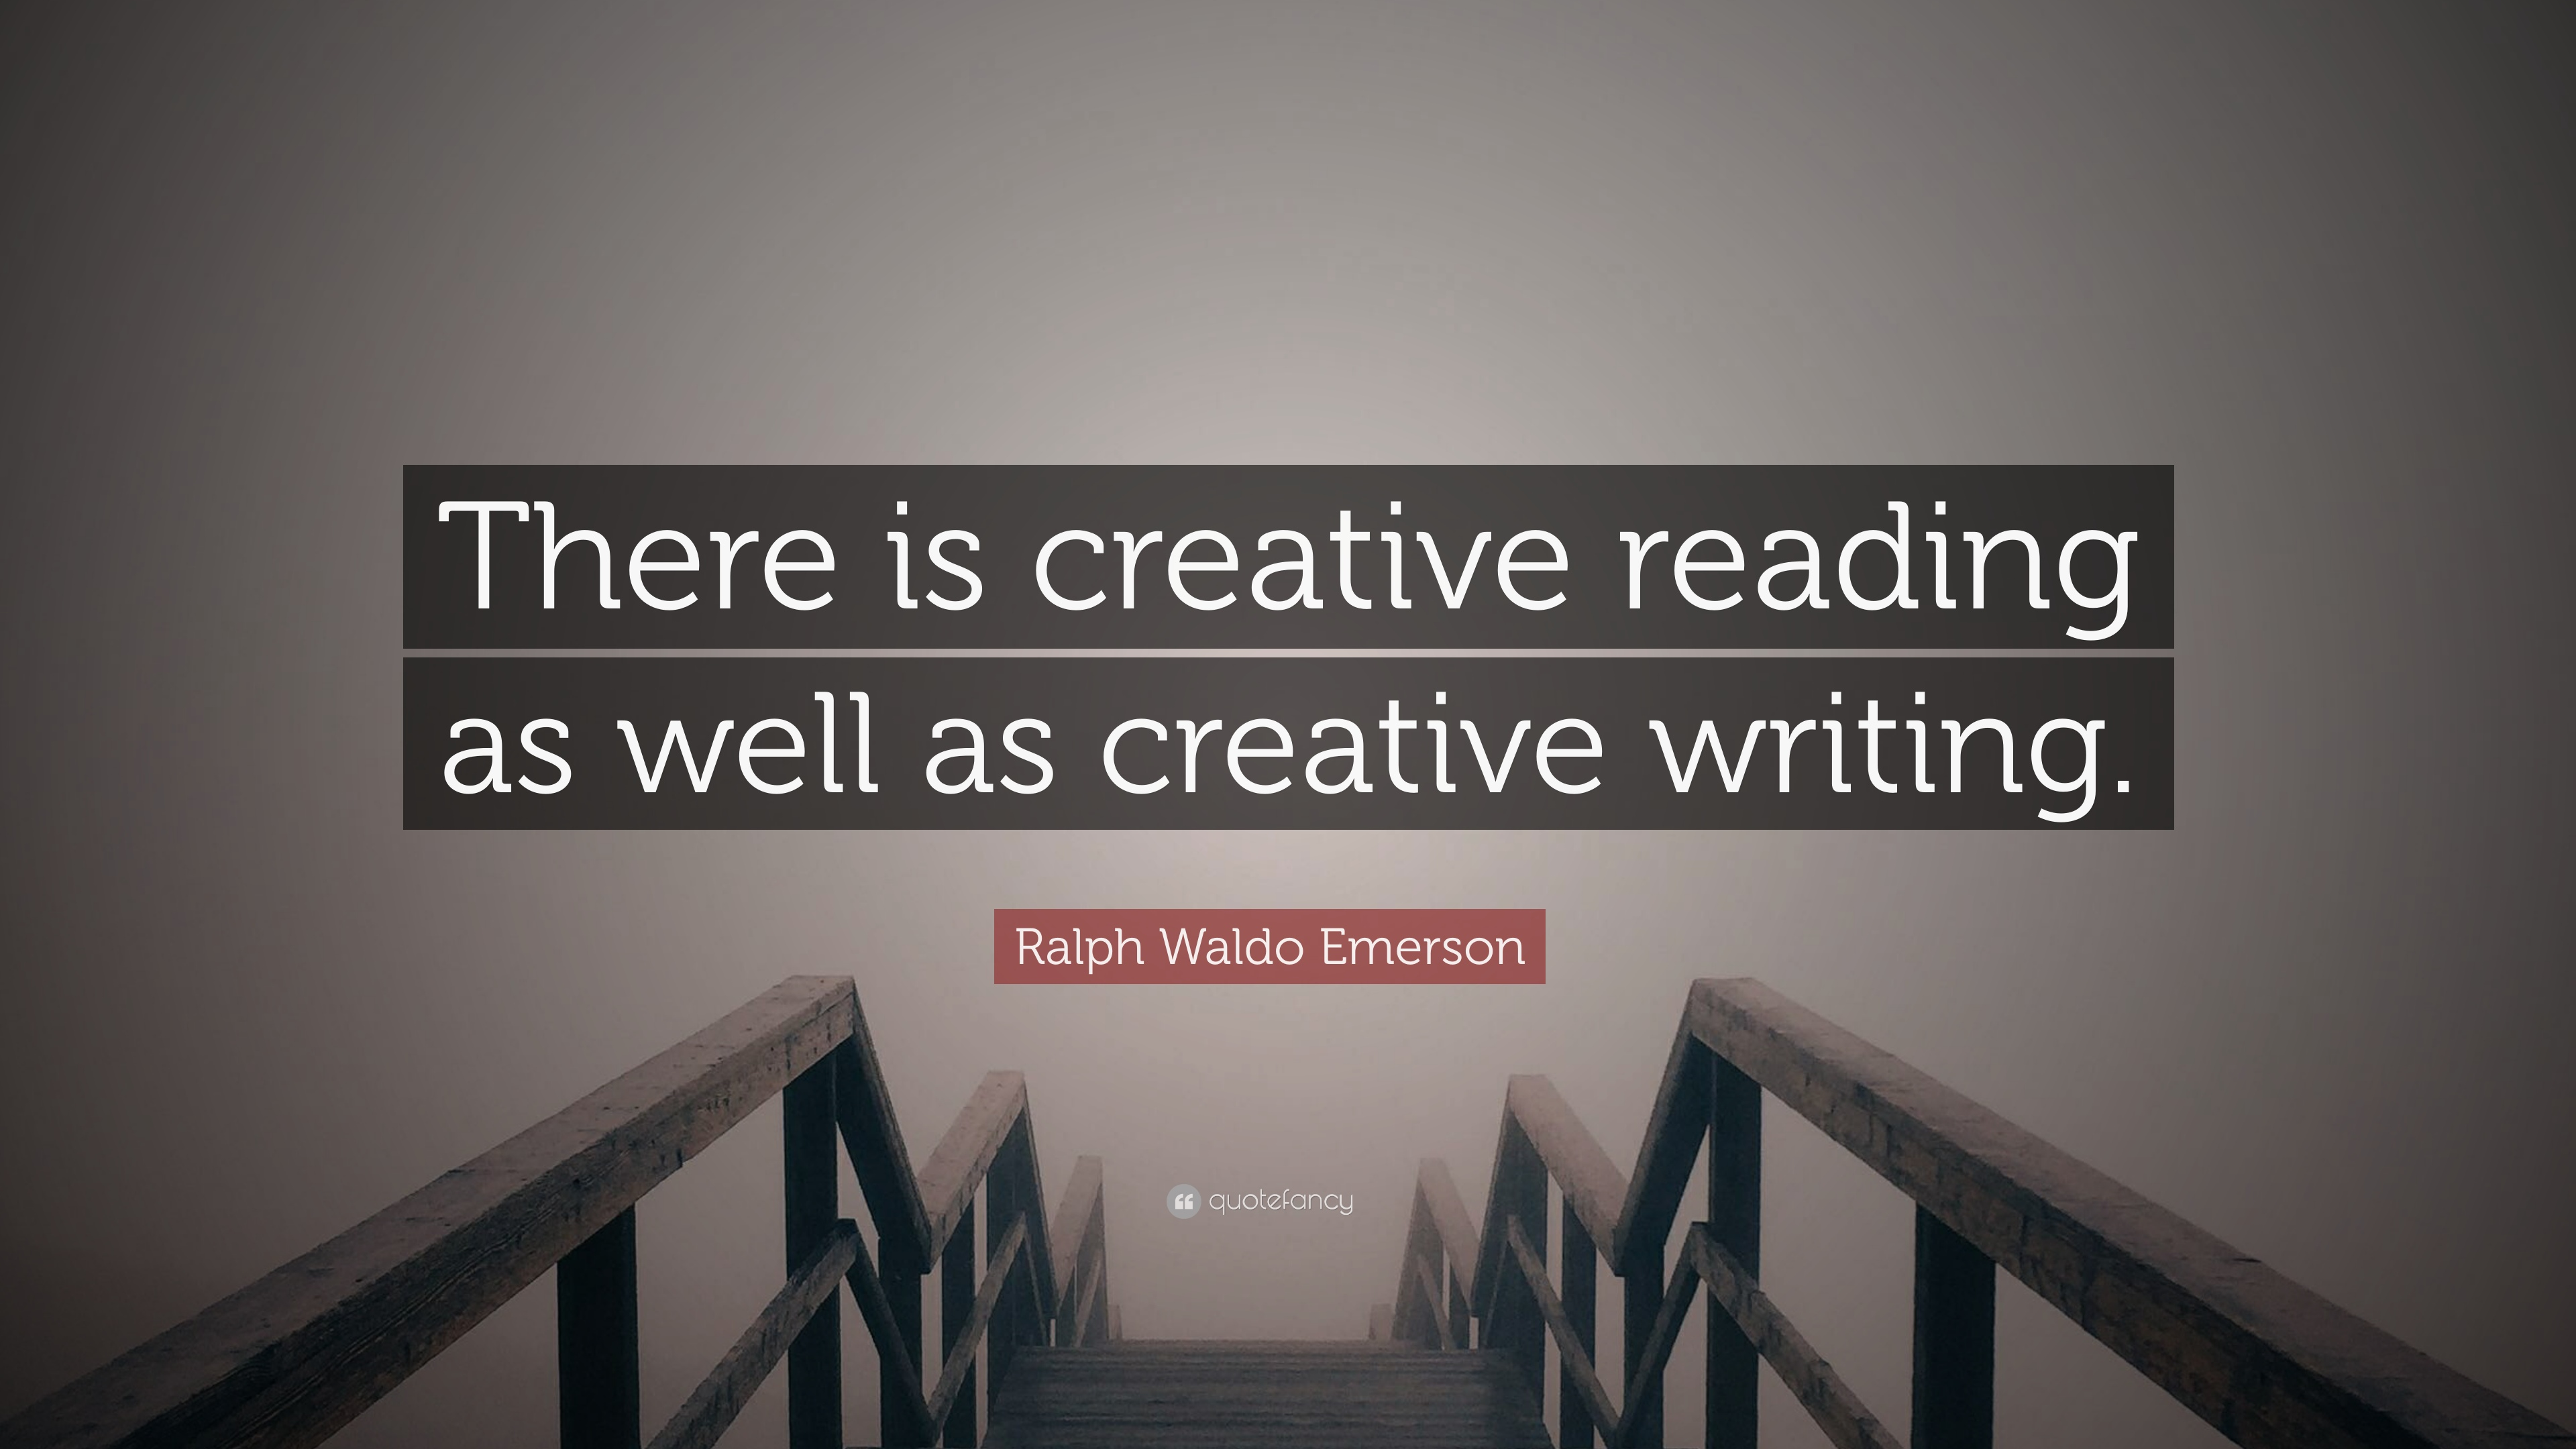 emerson mfa creative writing ranking